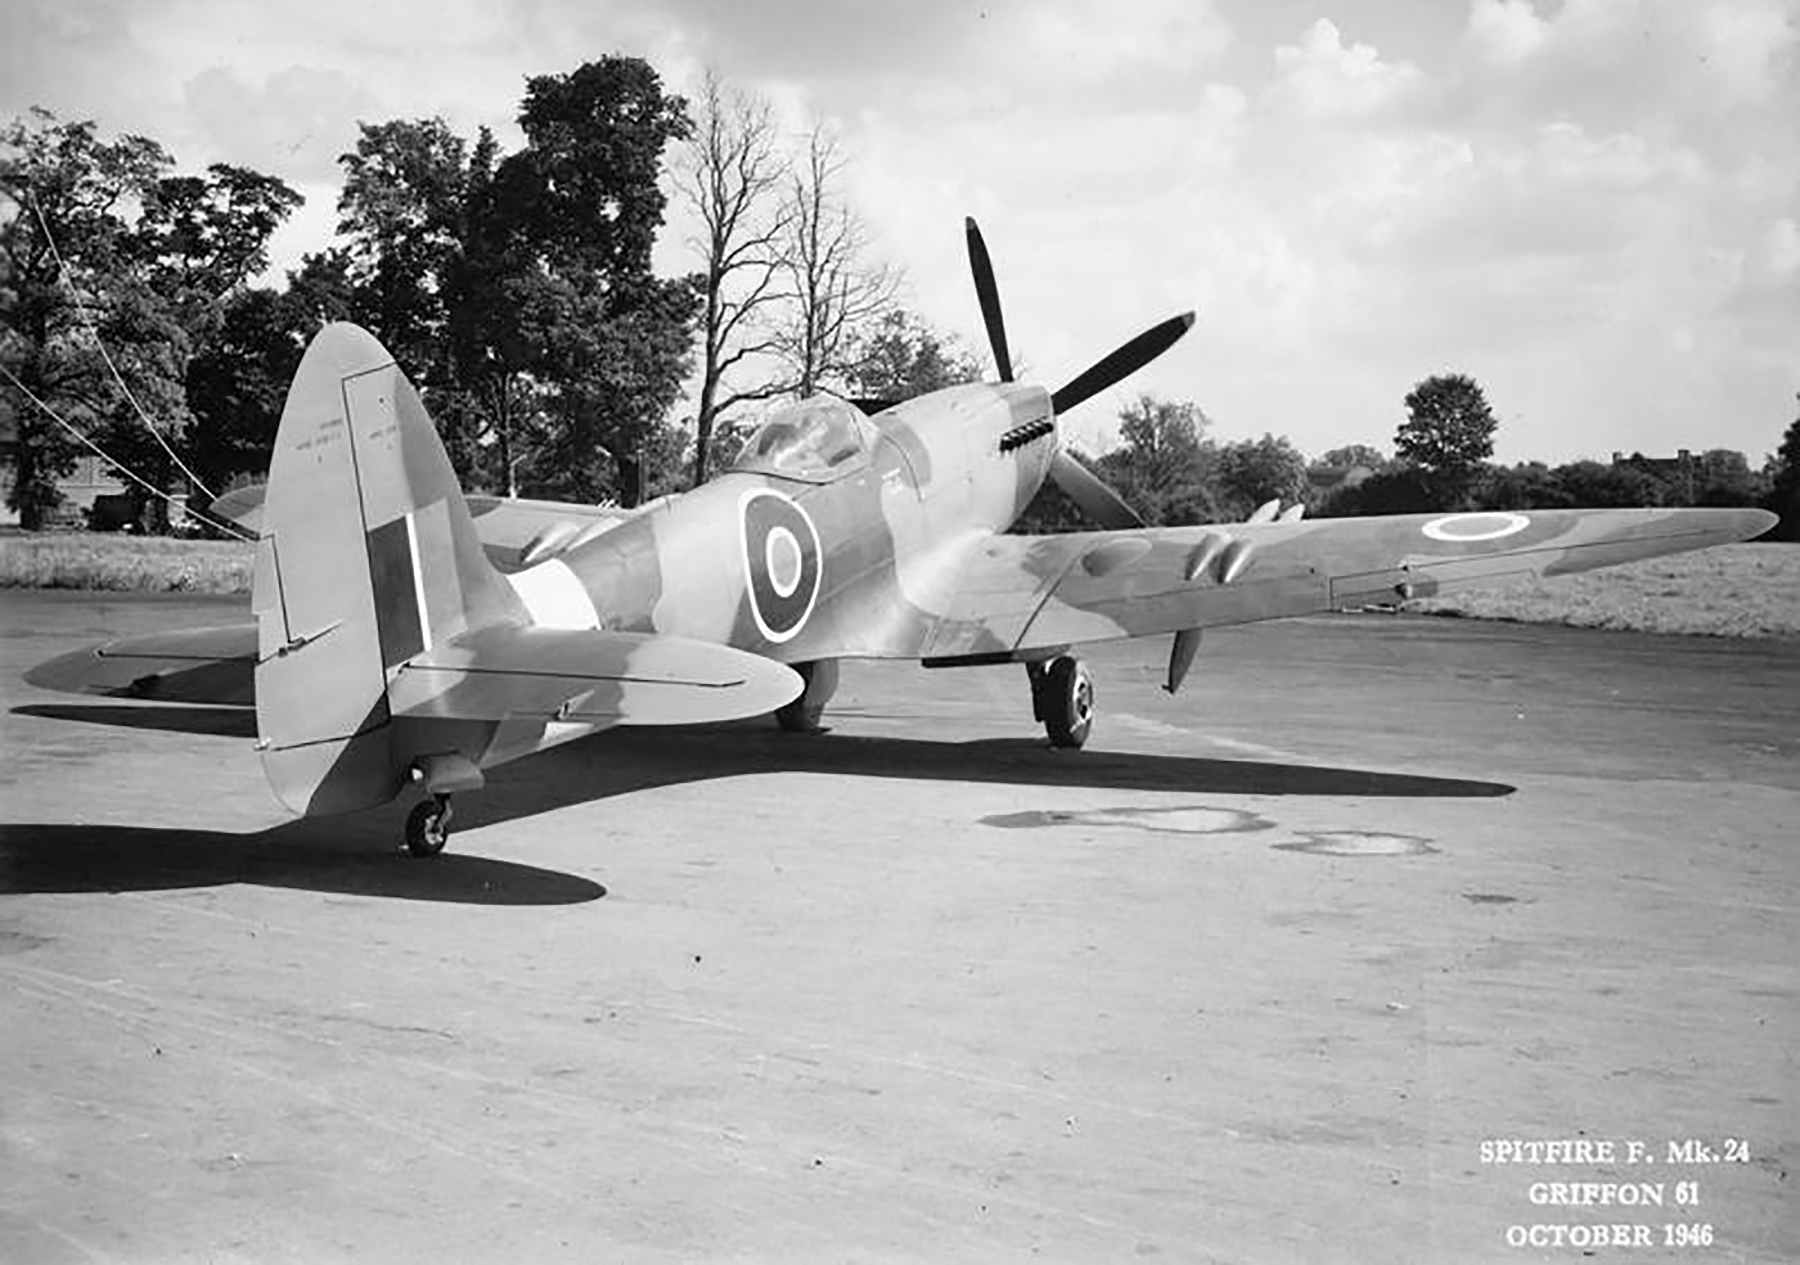 Spitfire F24 PK713 Oct 1946 03